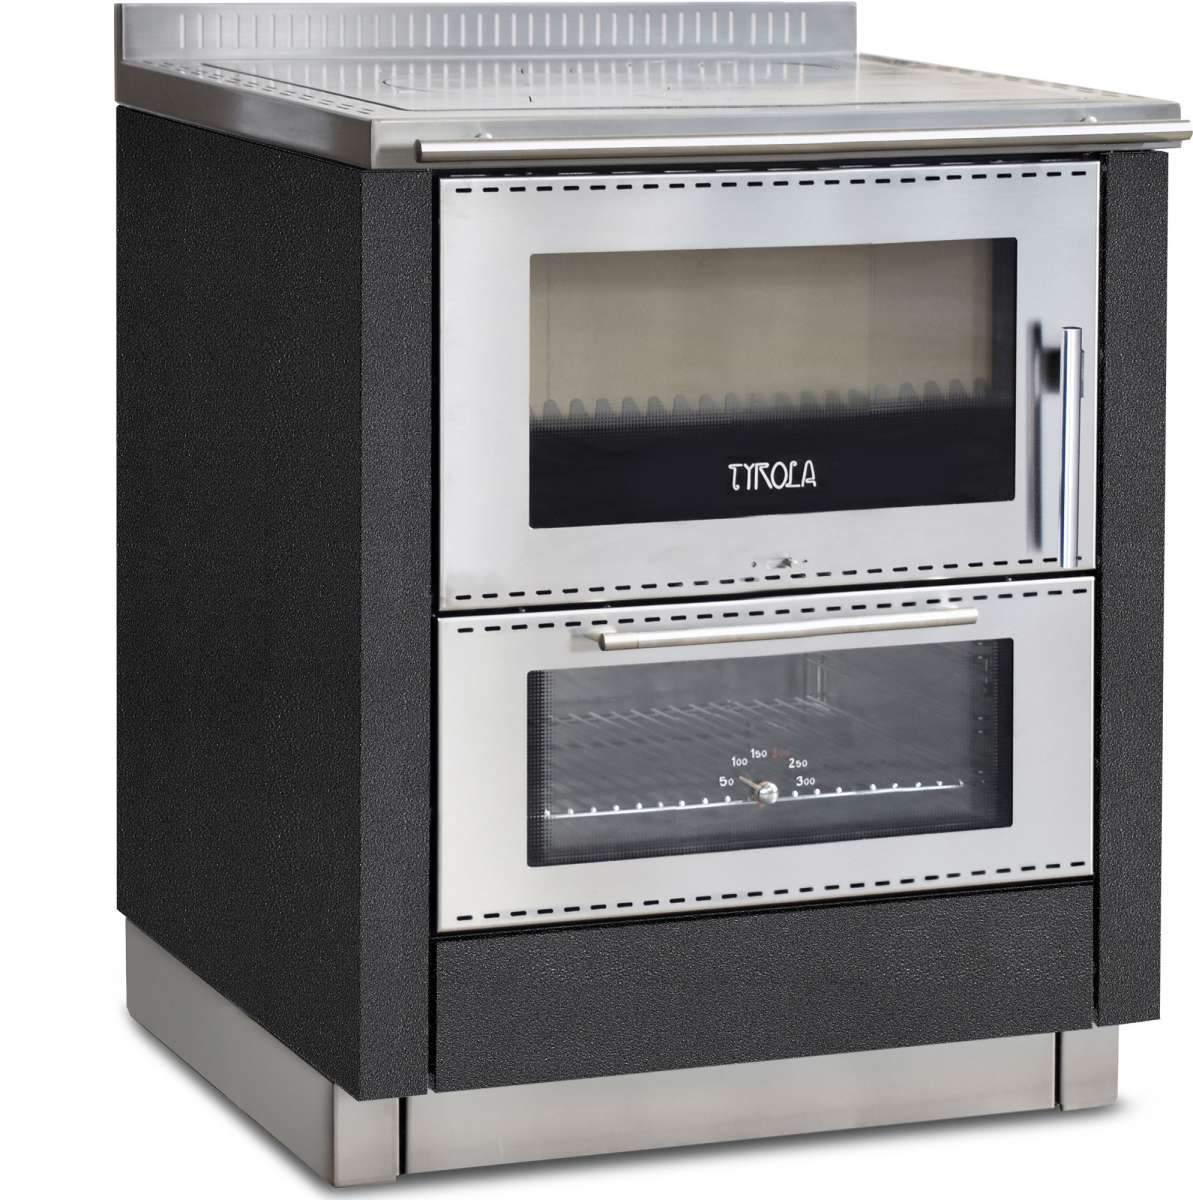 TRF 80 antikschwarz 600x600 2x